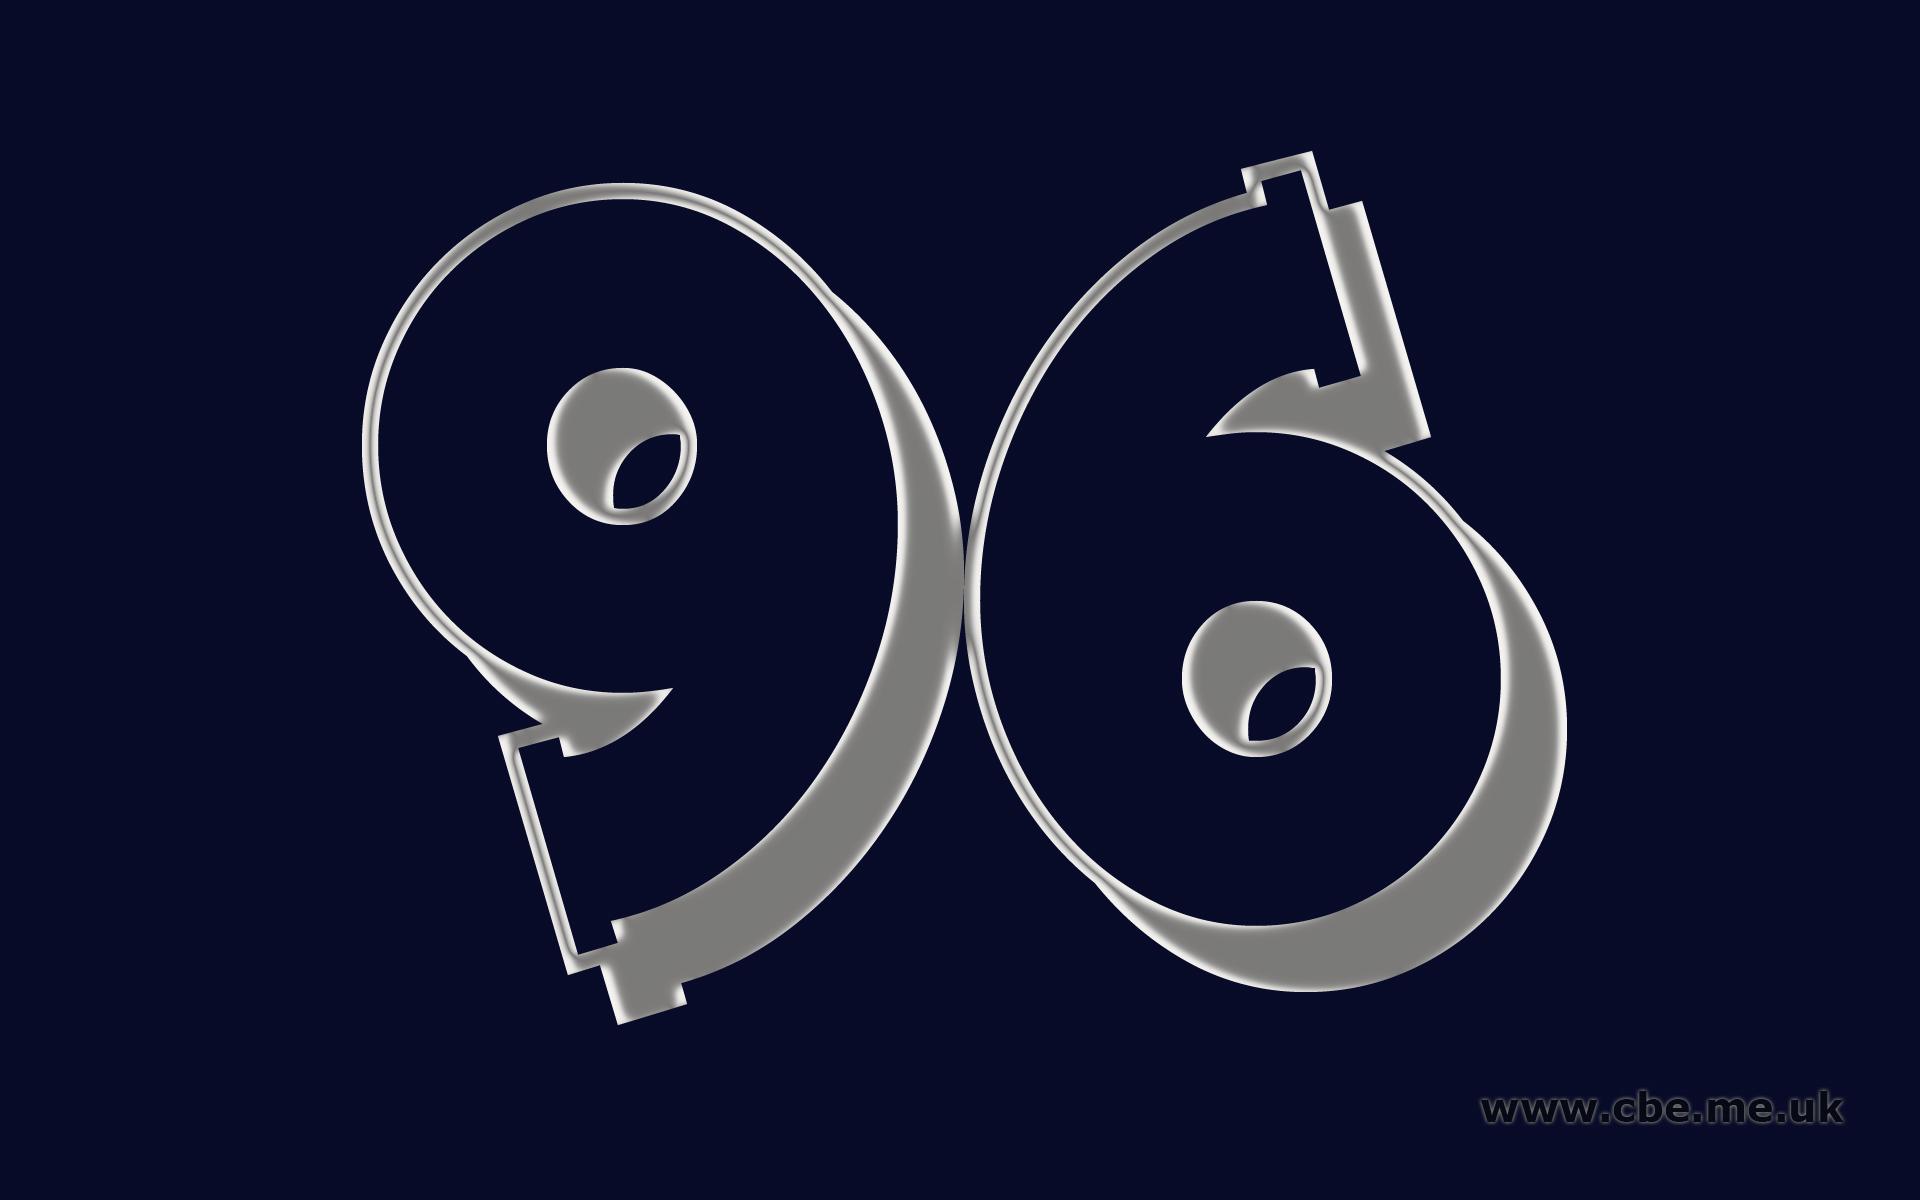 Картинки цифра 96, открытка изображением